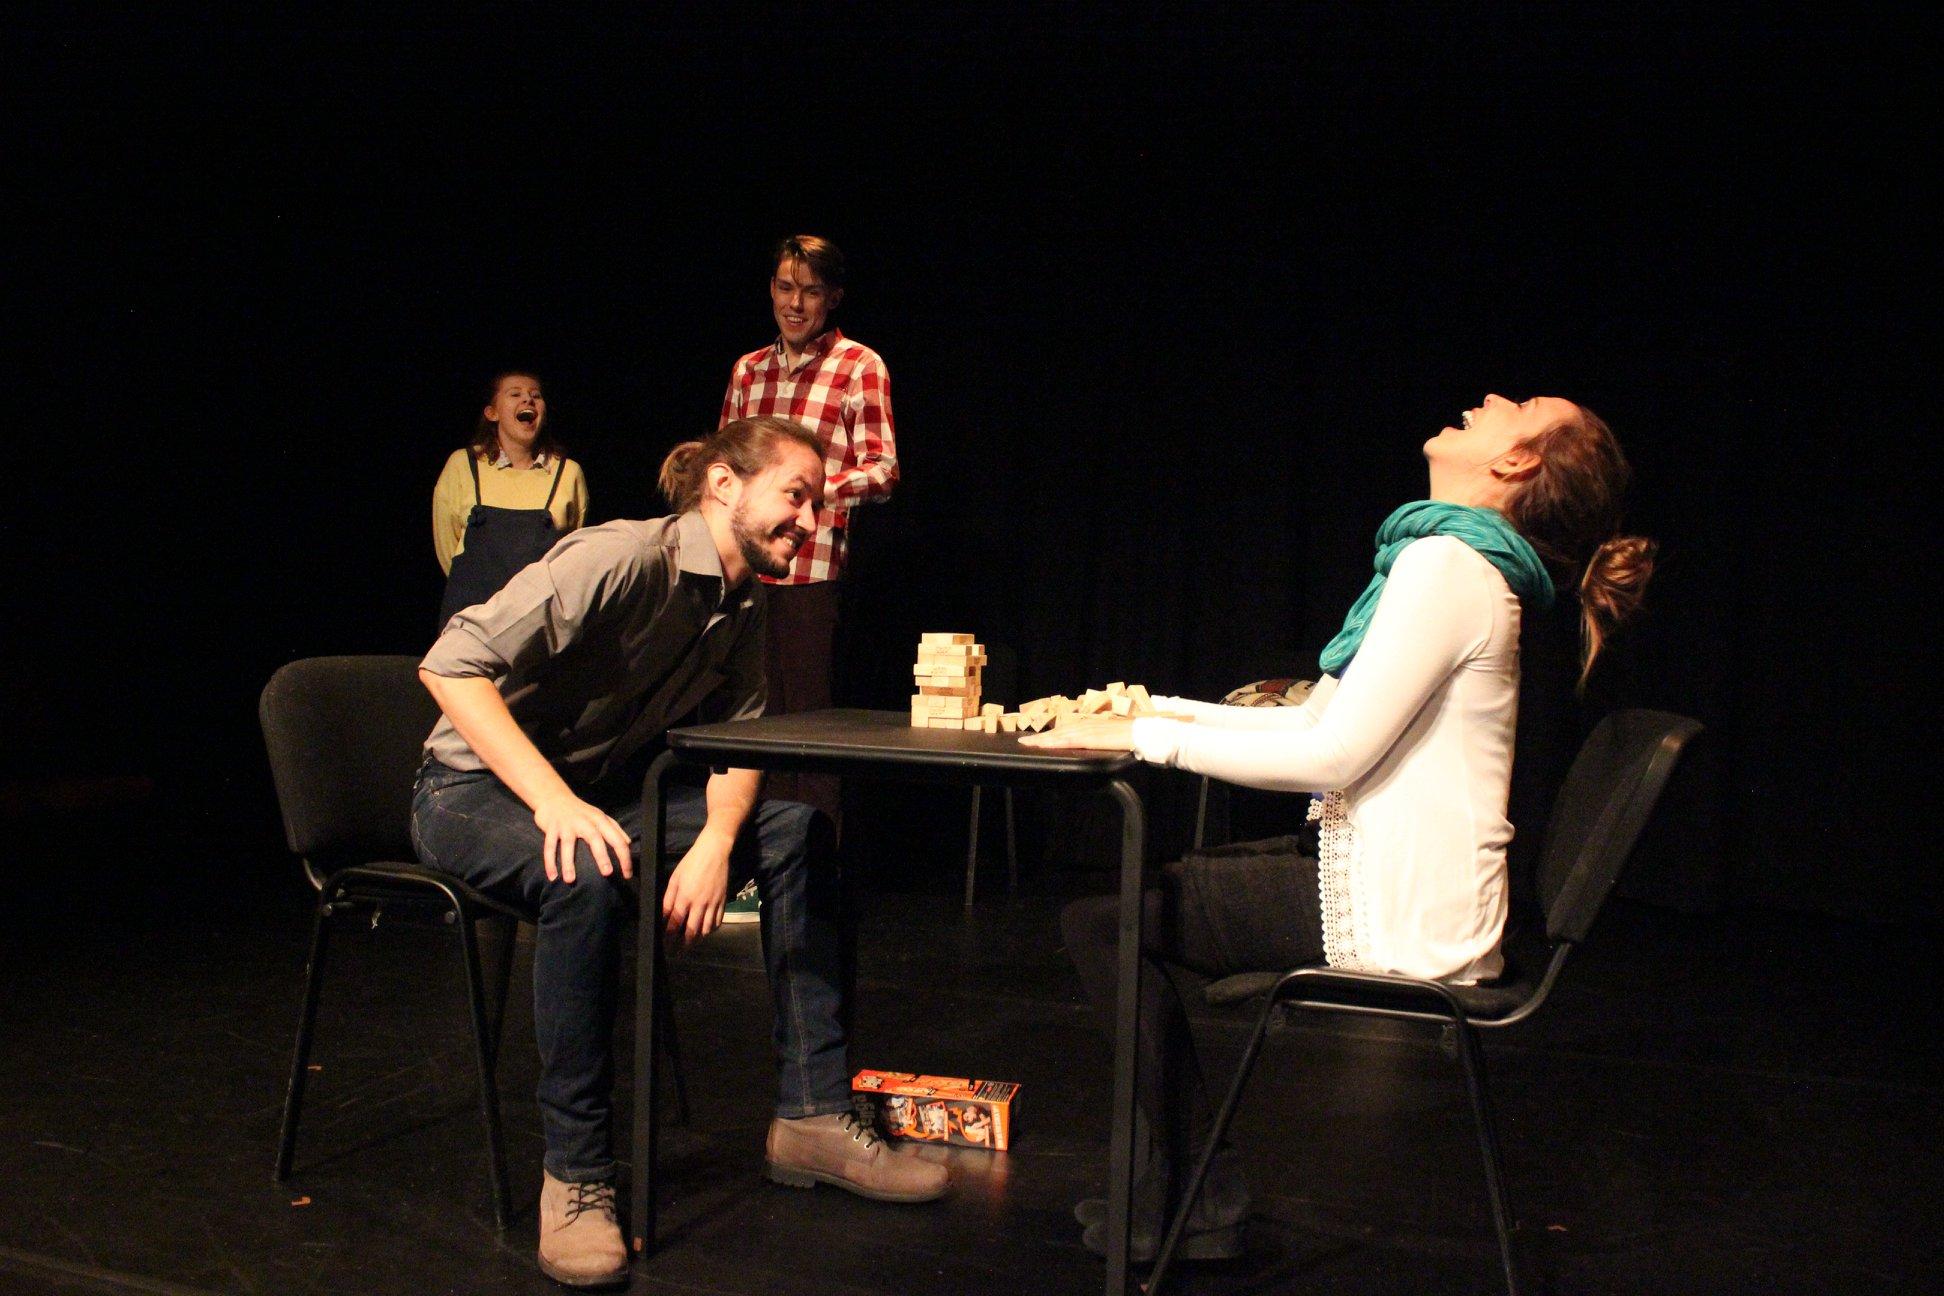 'Singles Night' play by Mark Ralph - Bowman